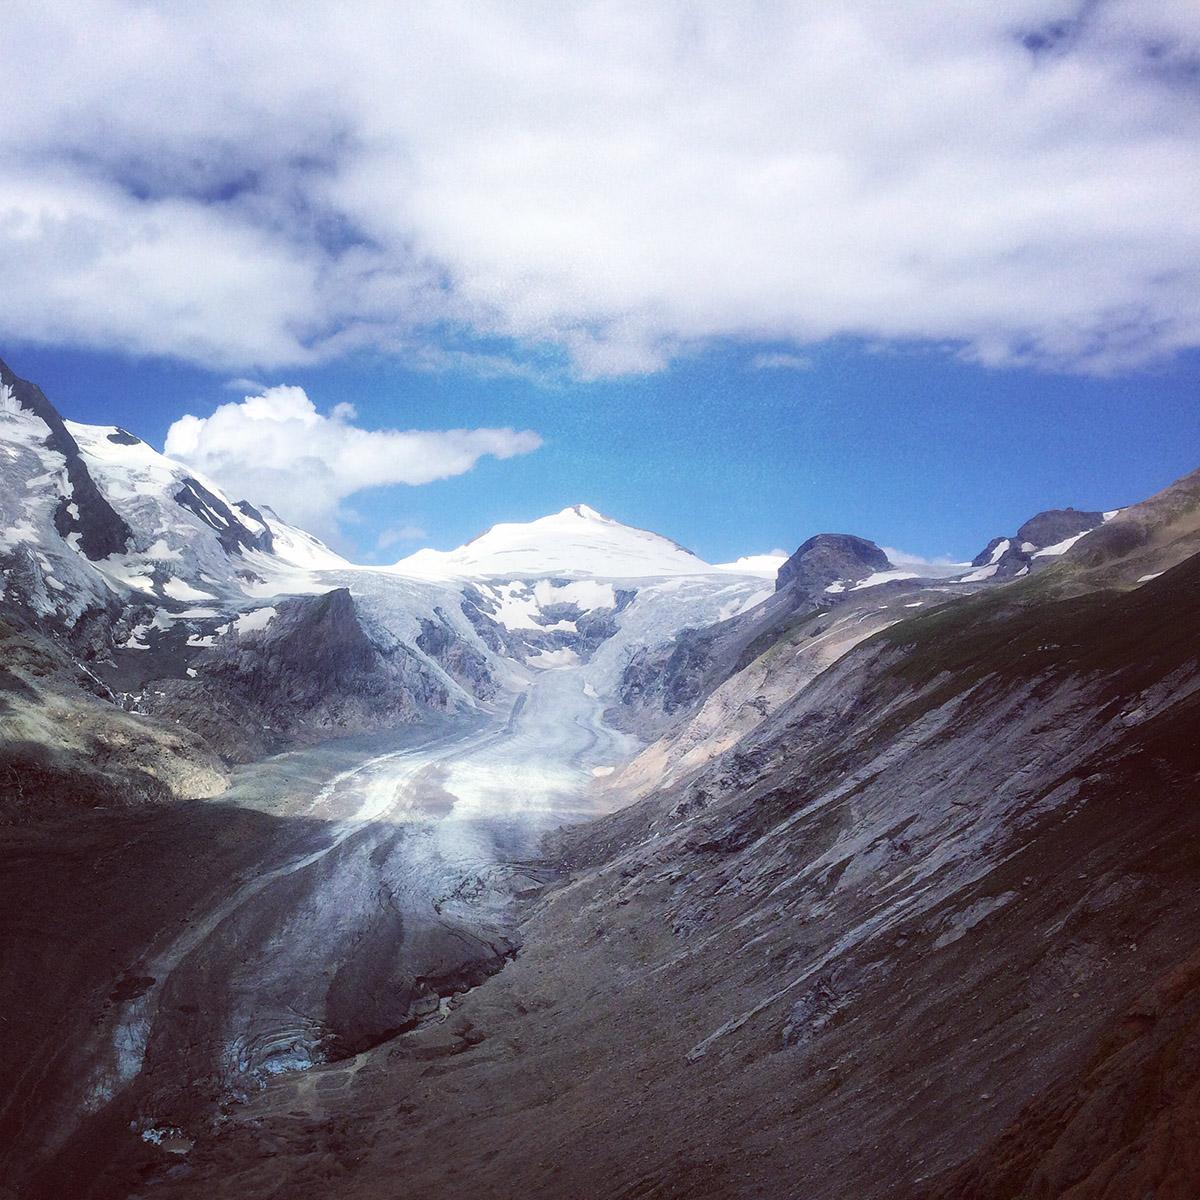 03-grossglockner-glacier-Kaiser-Franz-Josefs-Höhe